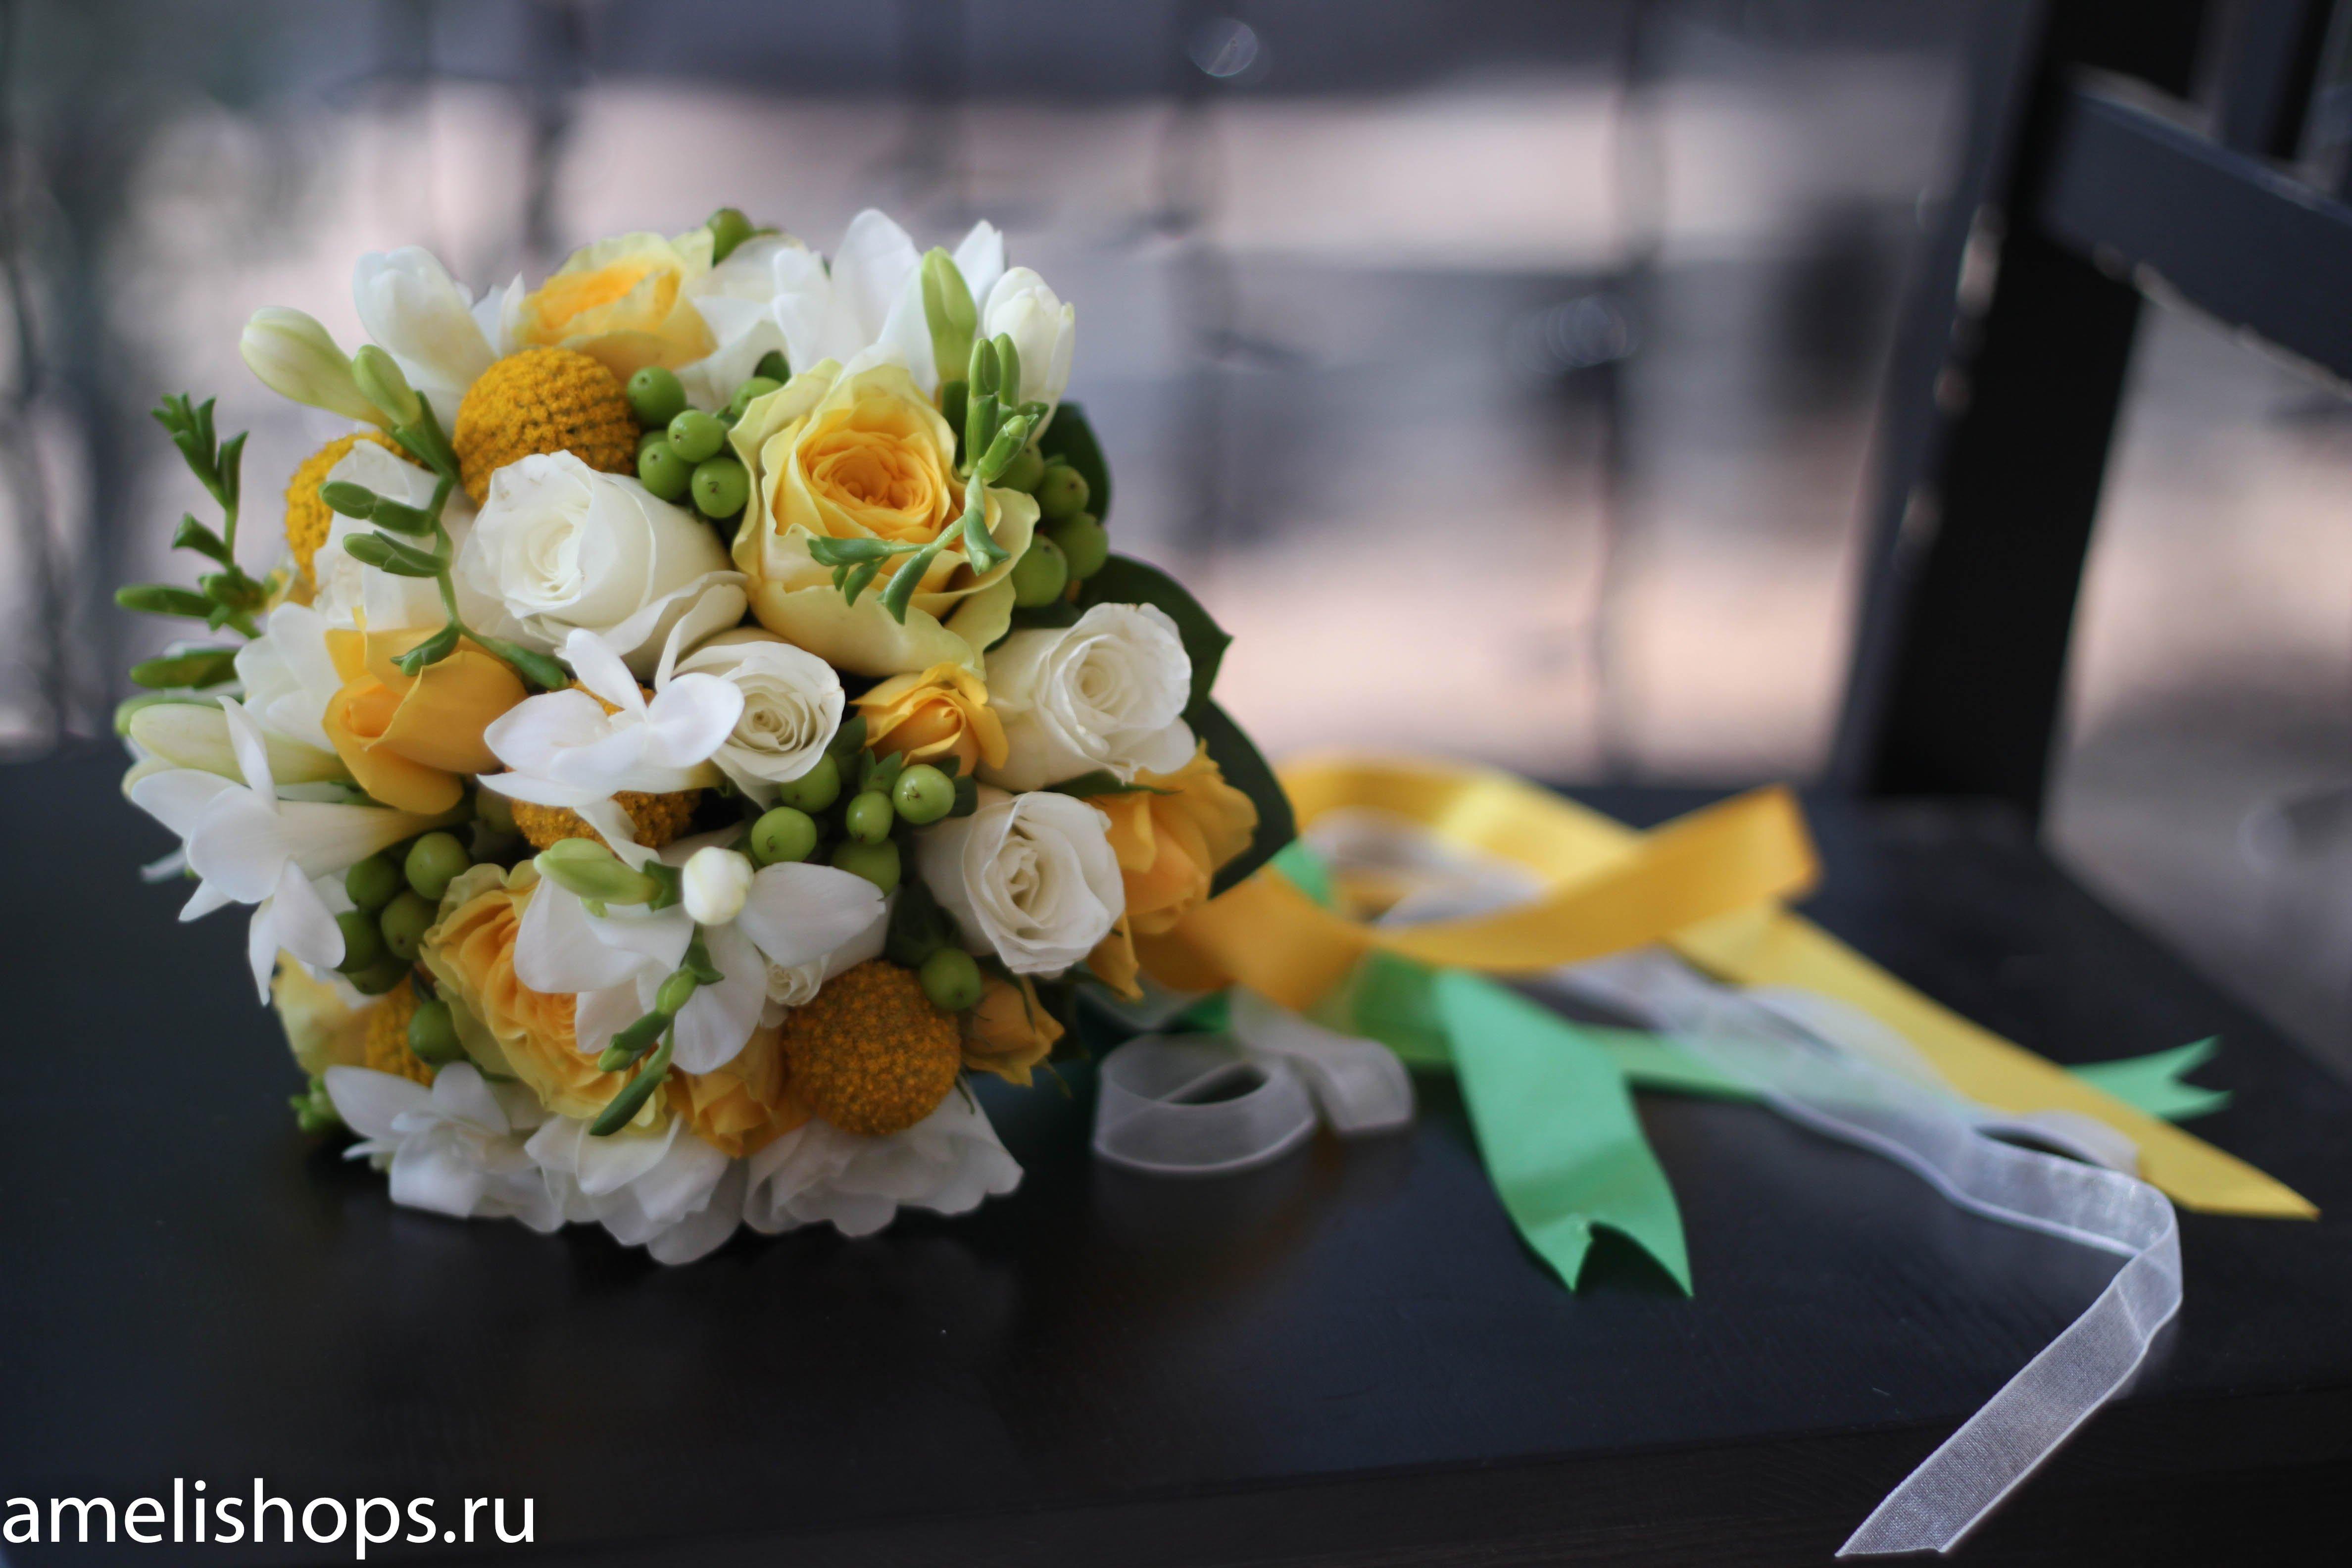 http://amelishops.ru/images/upload/IMG_5042.jpg